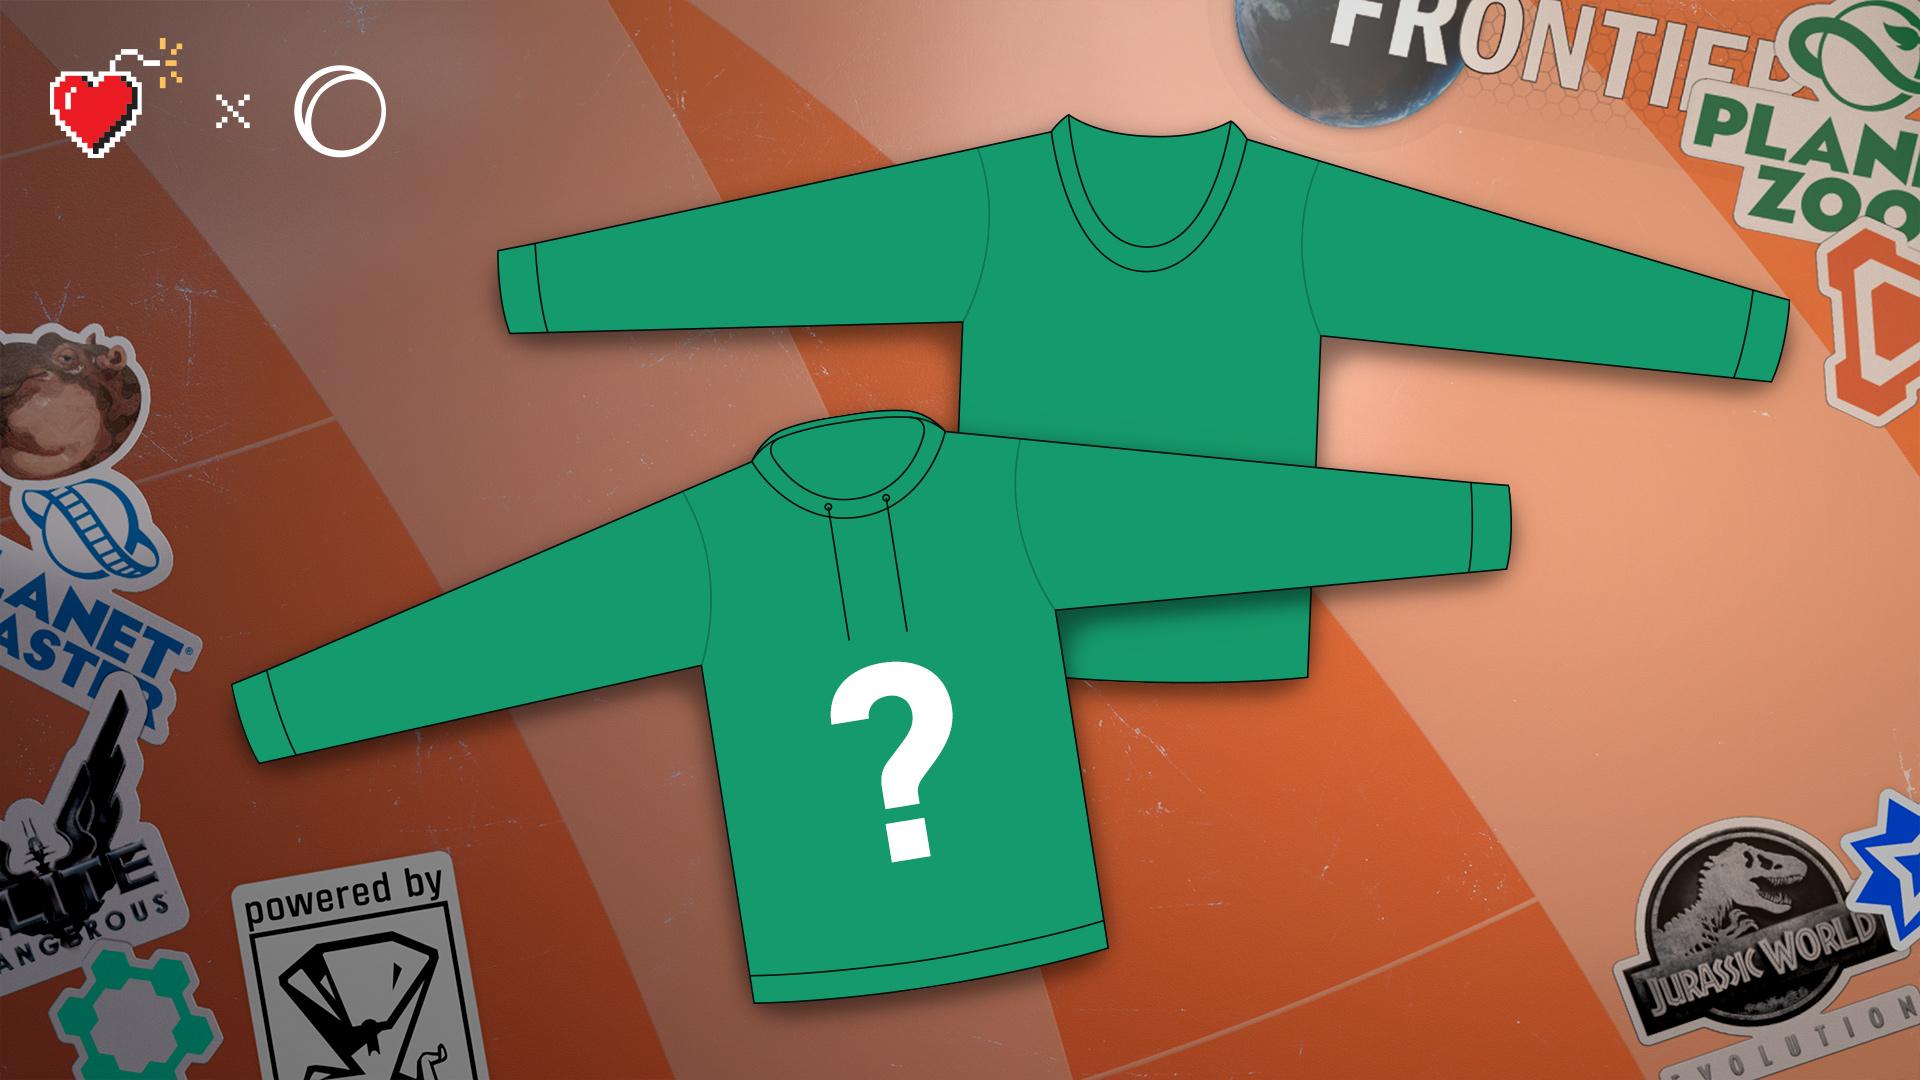 FR_charity_auction_PZ_hoodie.jpg